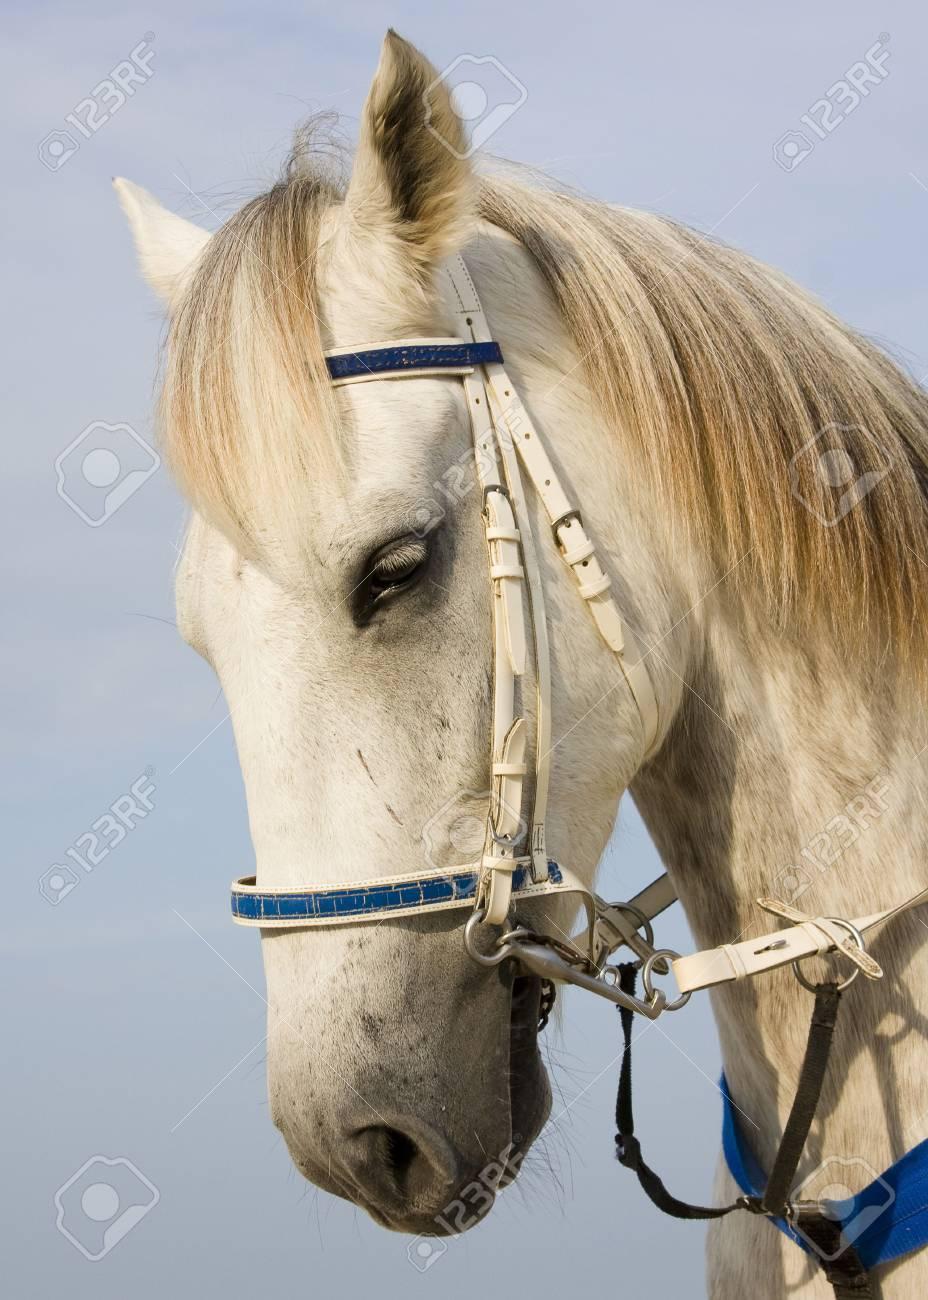 Horse head portrait Stock Photo - 8231342